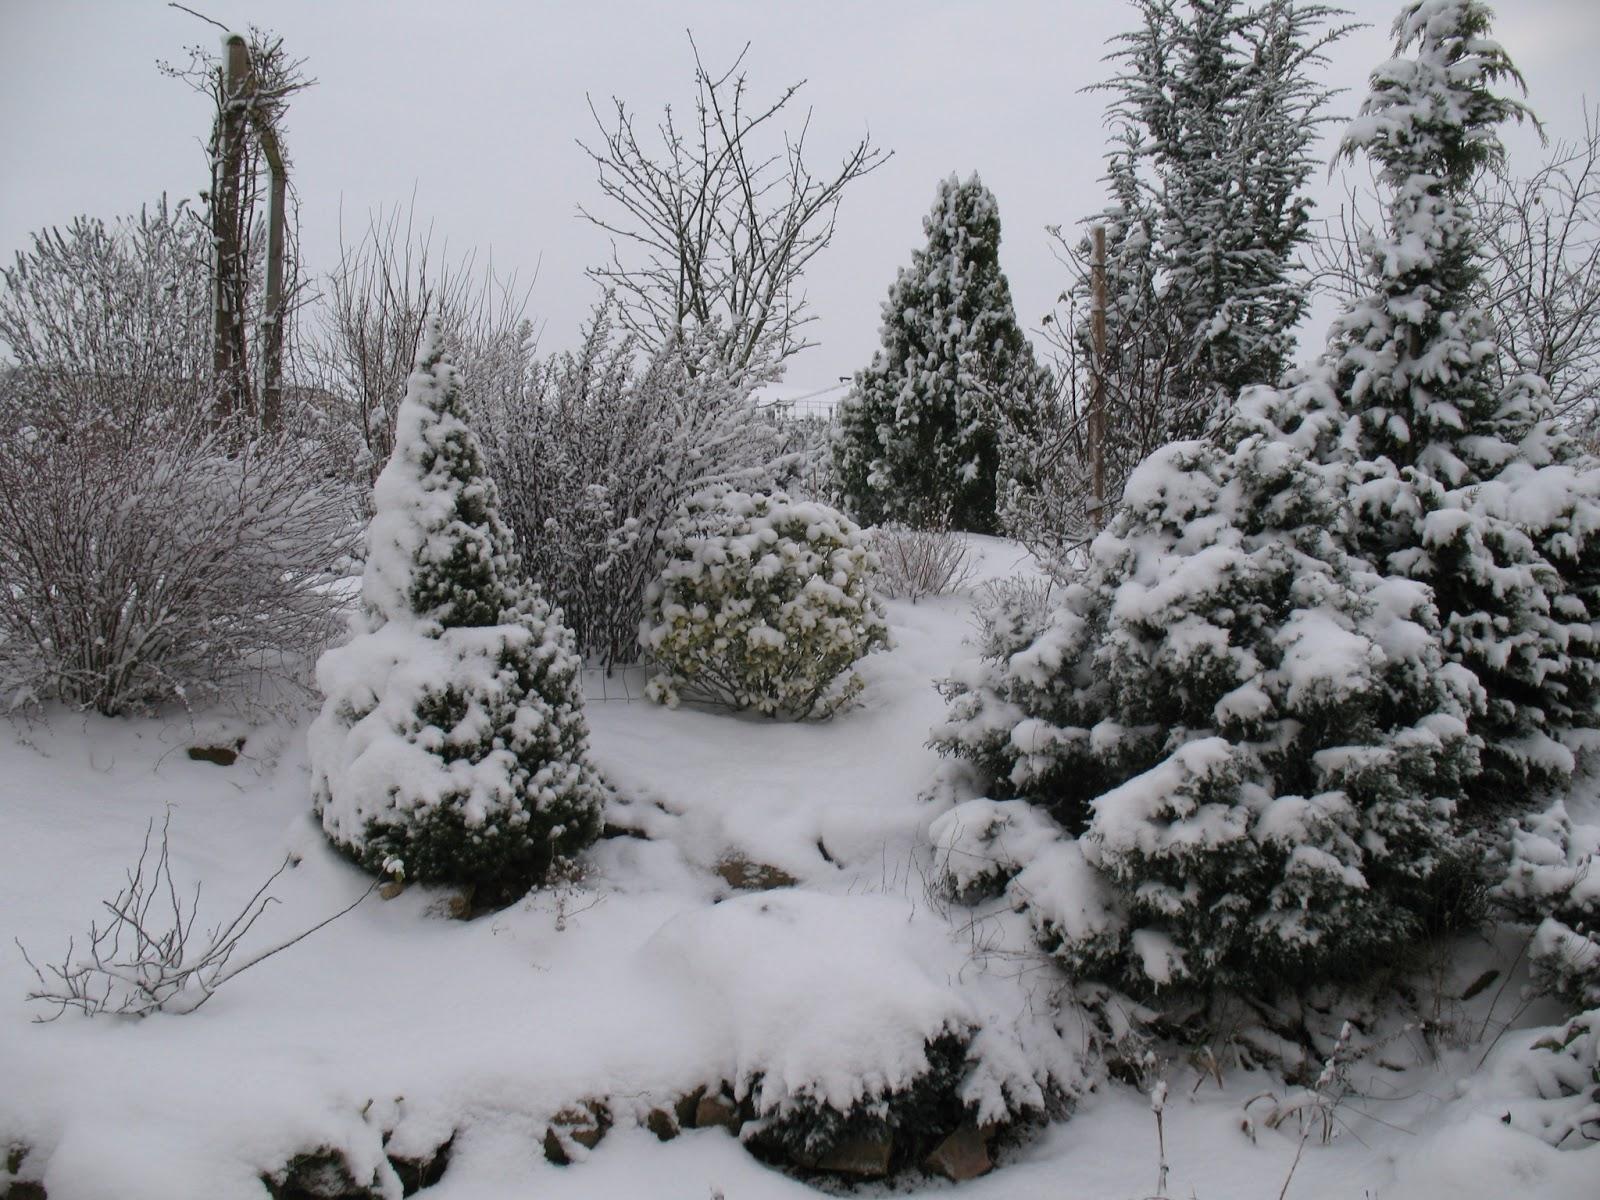 Roses du jardin ch neland le jardin sous la neige - Jardin de chen ...